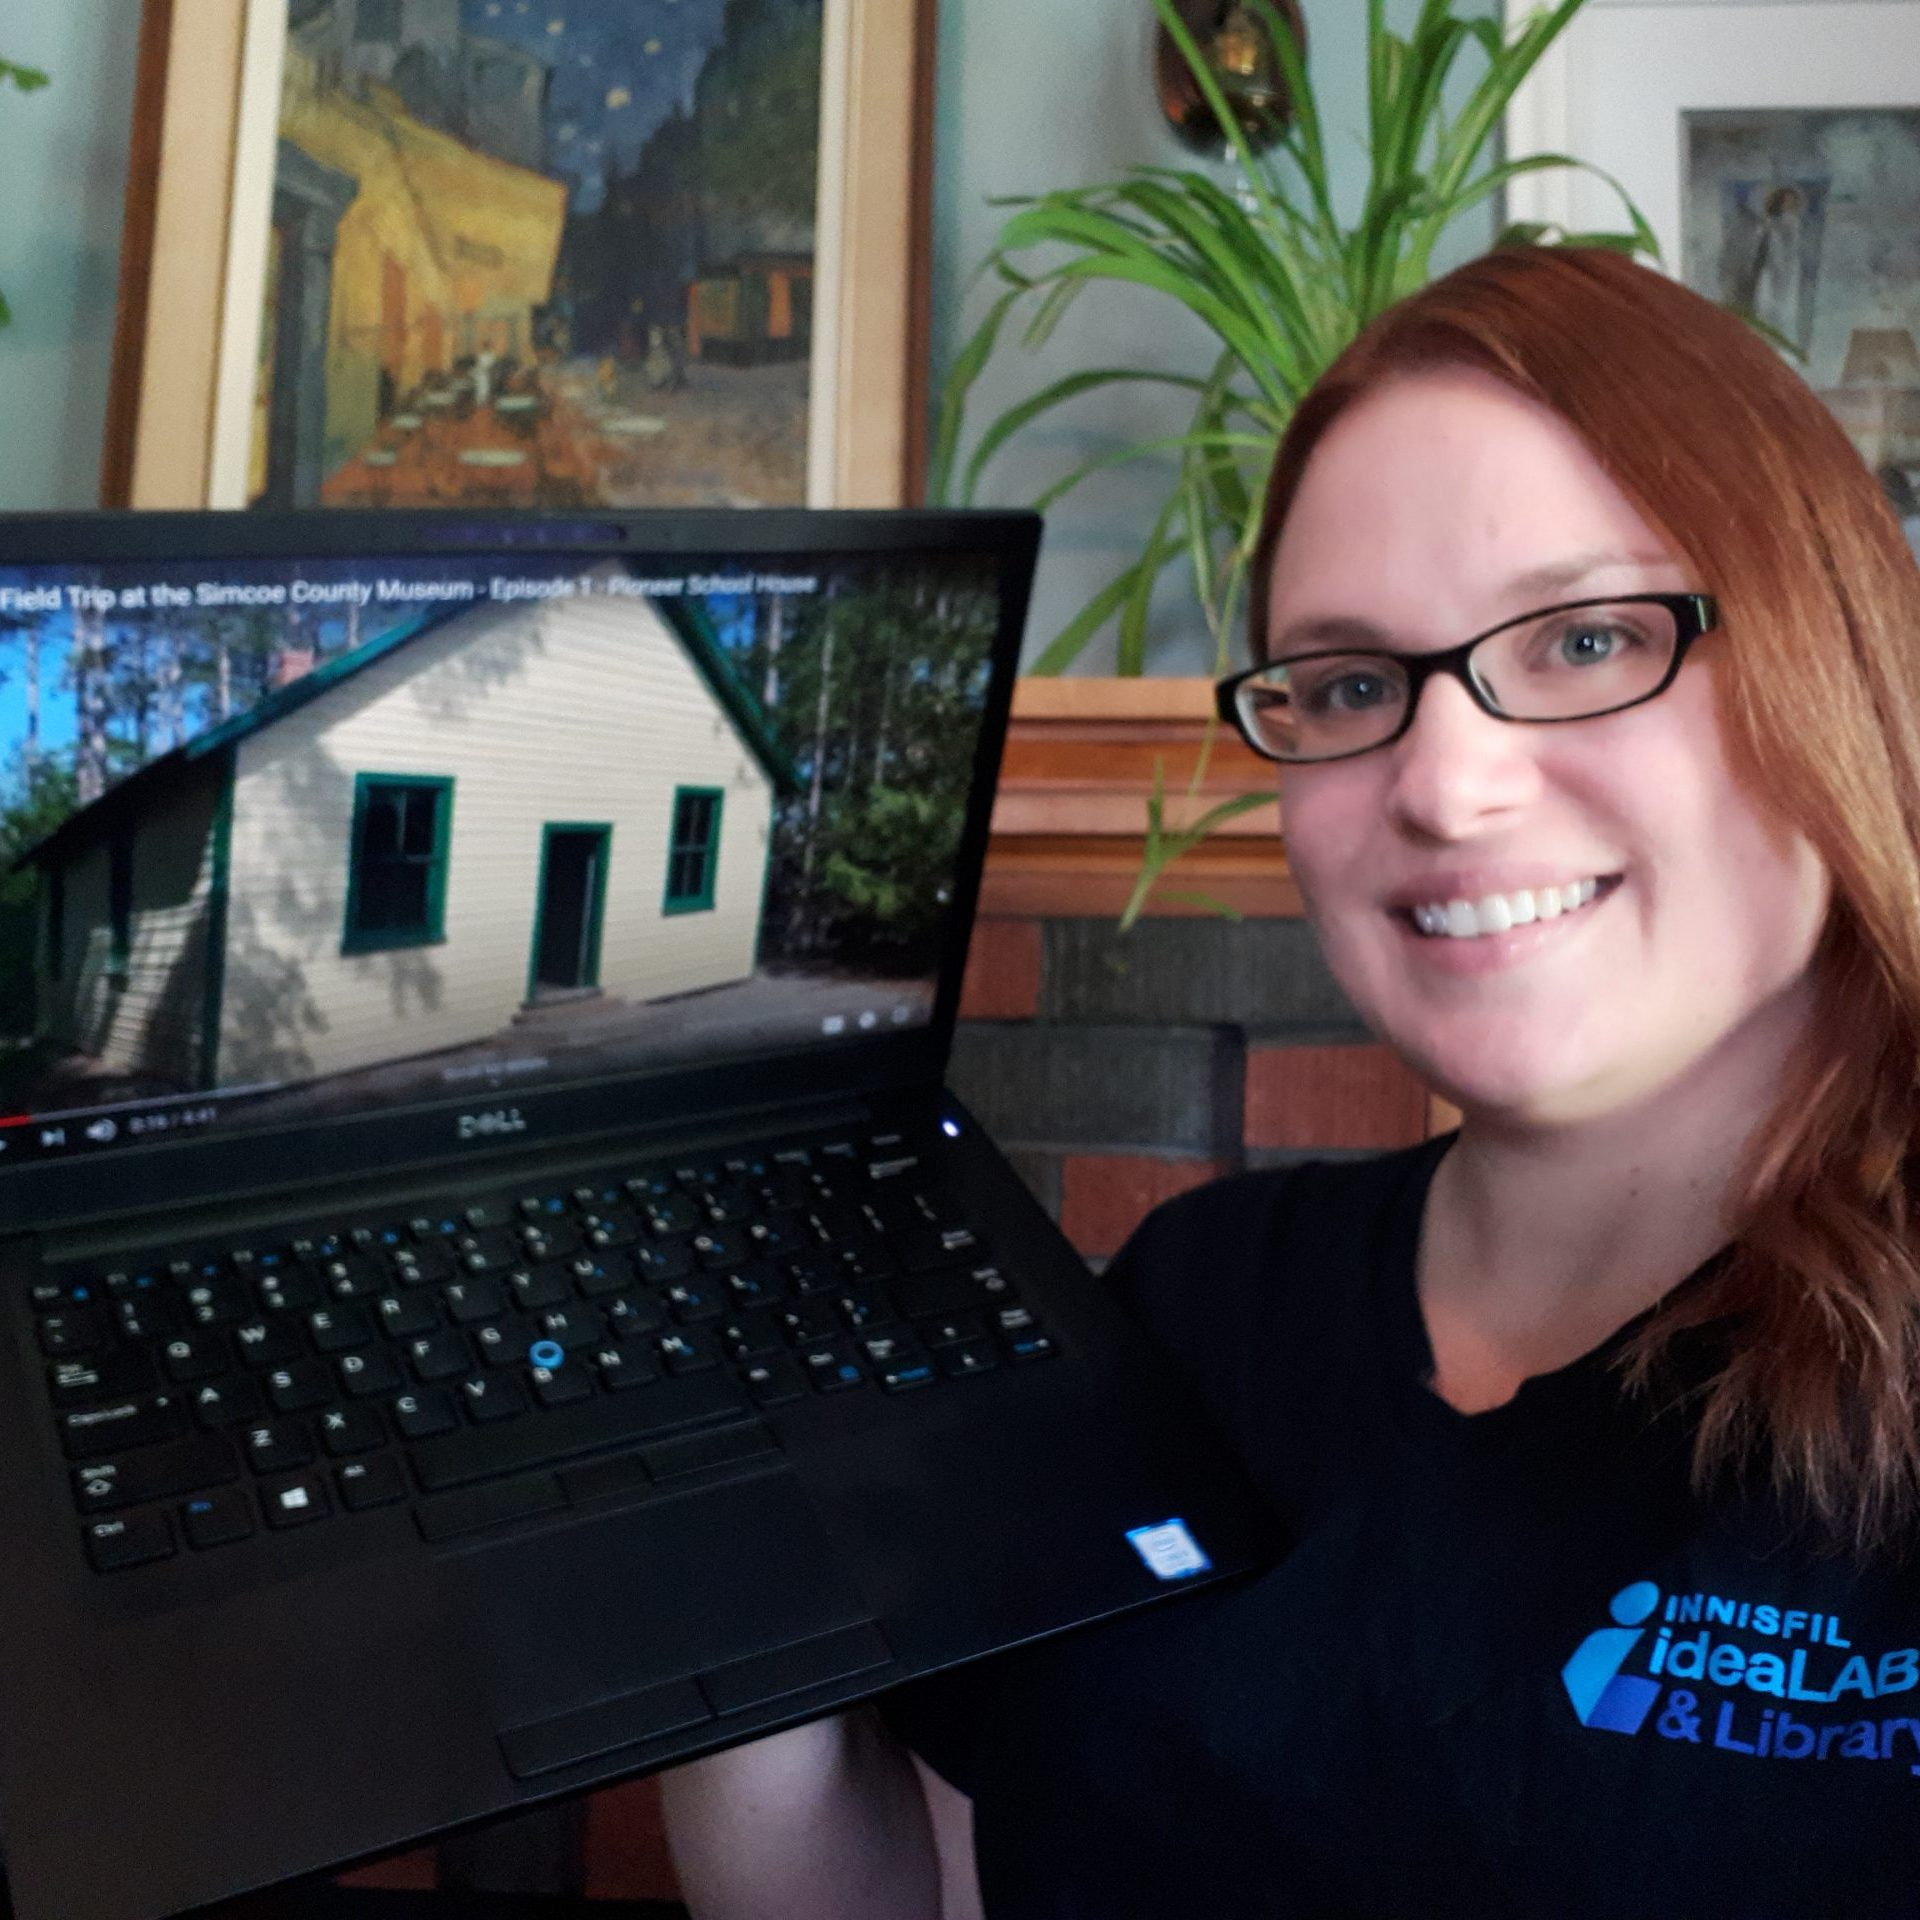 Simcoe County Museum Virtual Field Trips